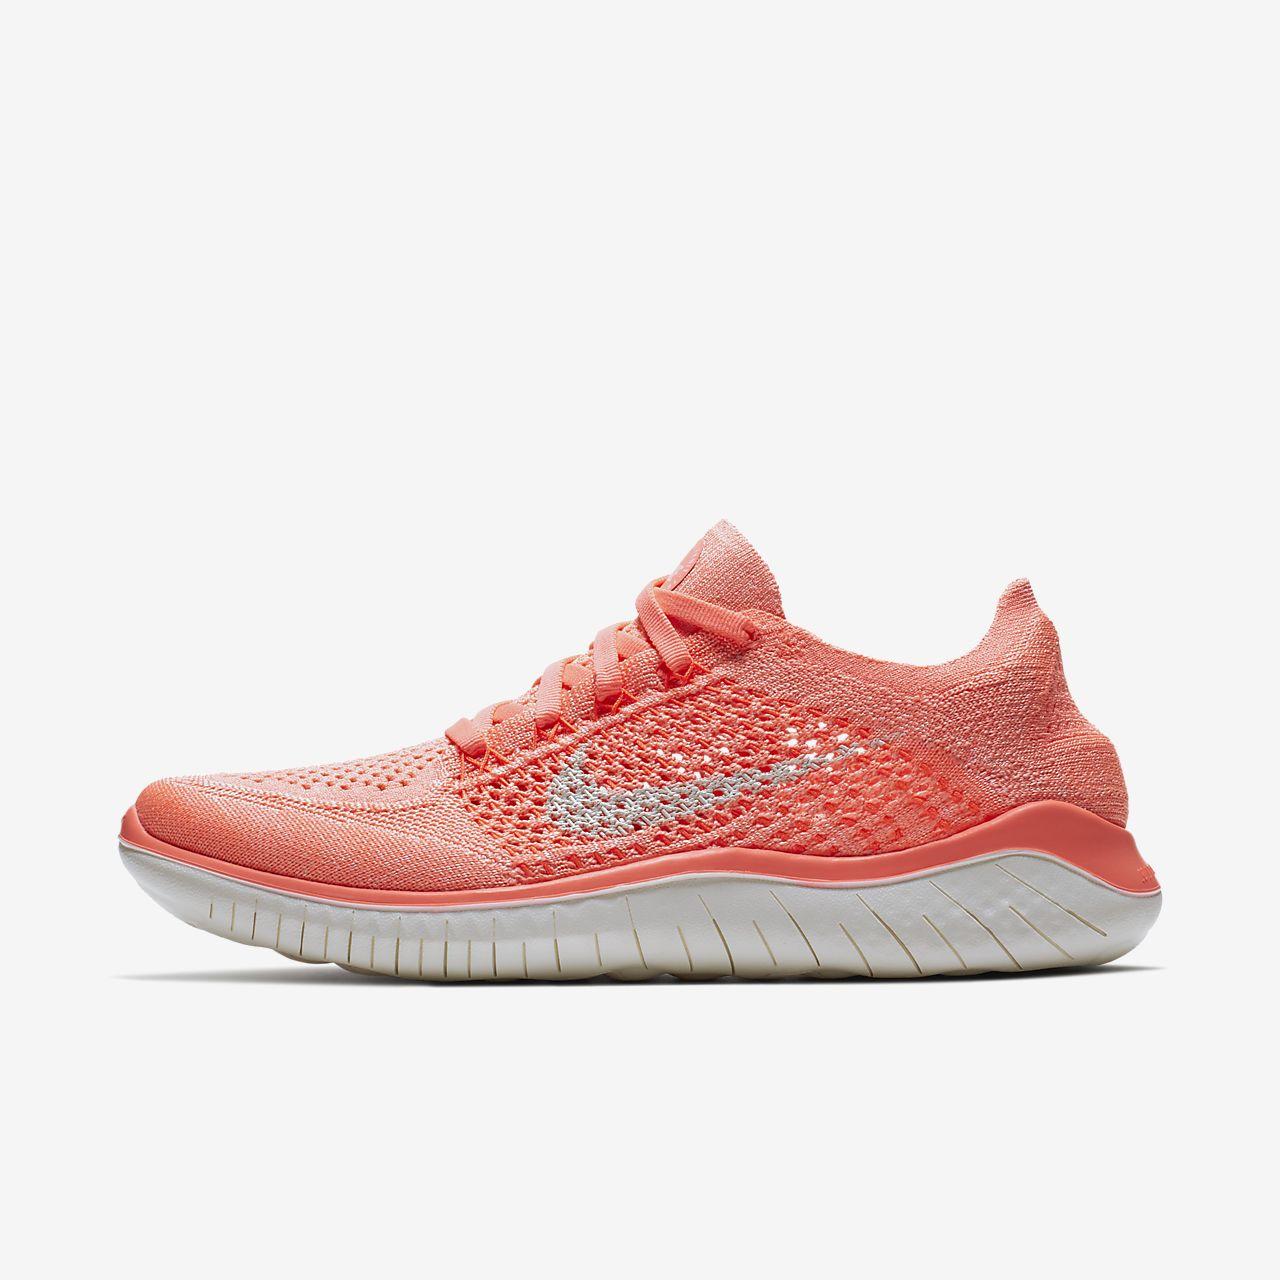 Sapatilhas de running Nike Free RN Flyknit 2018 para mulher